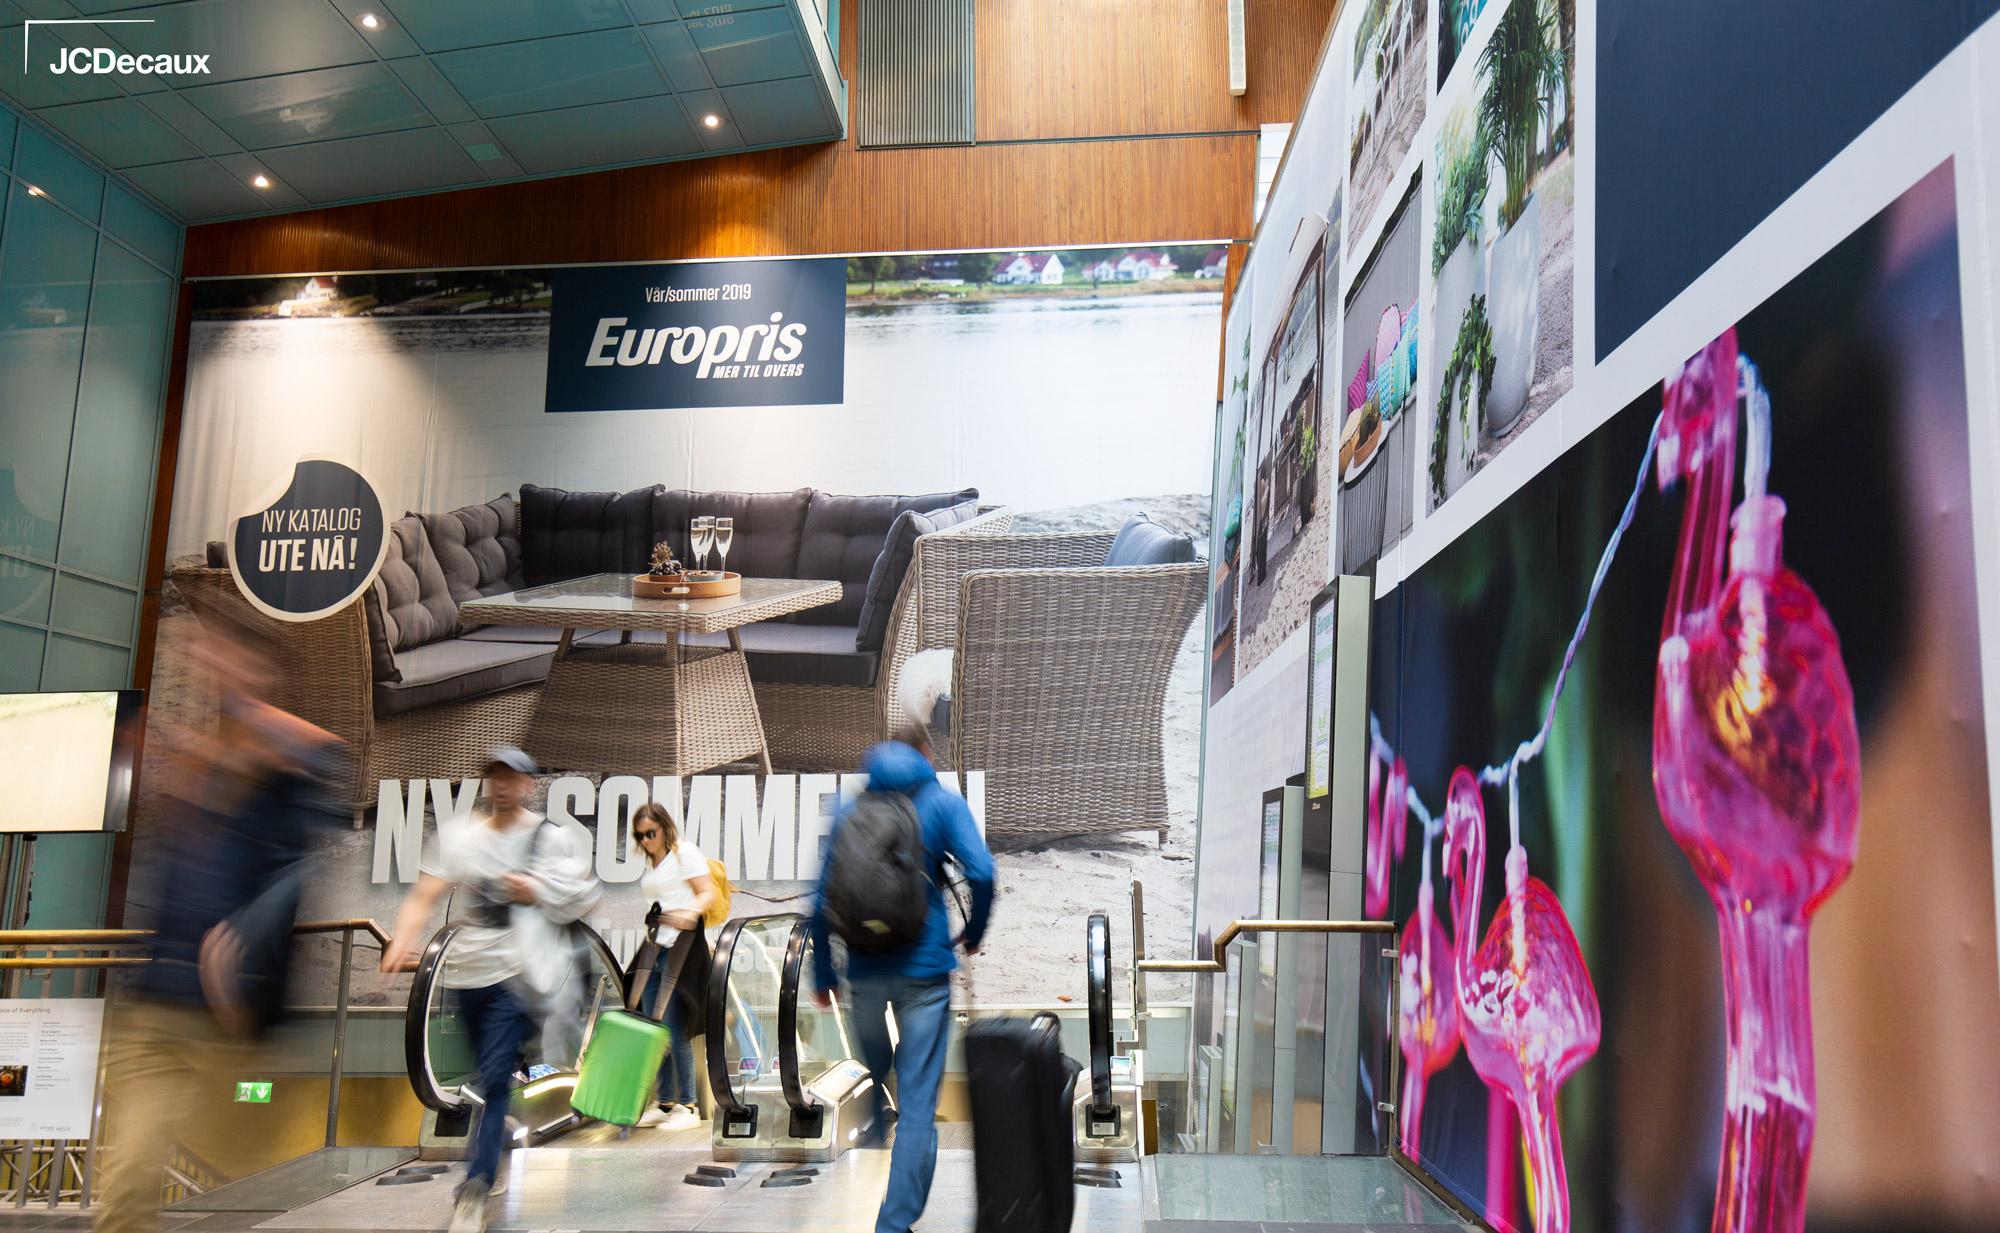 Europris-Escalator-Impact-Oslo-S-JCDecaux(2)